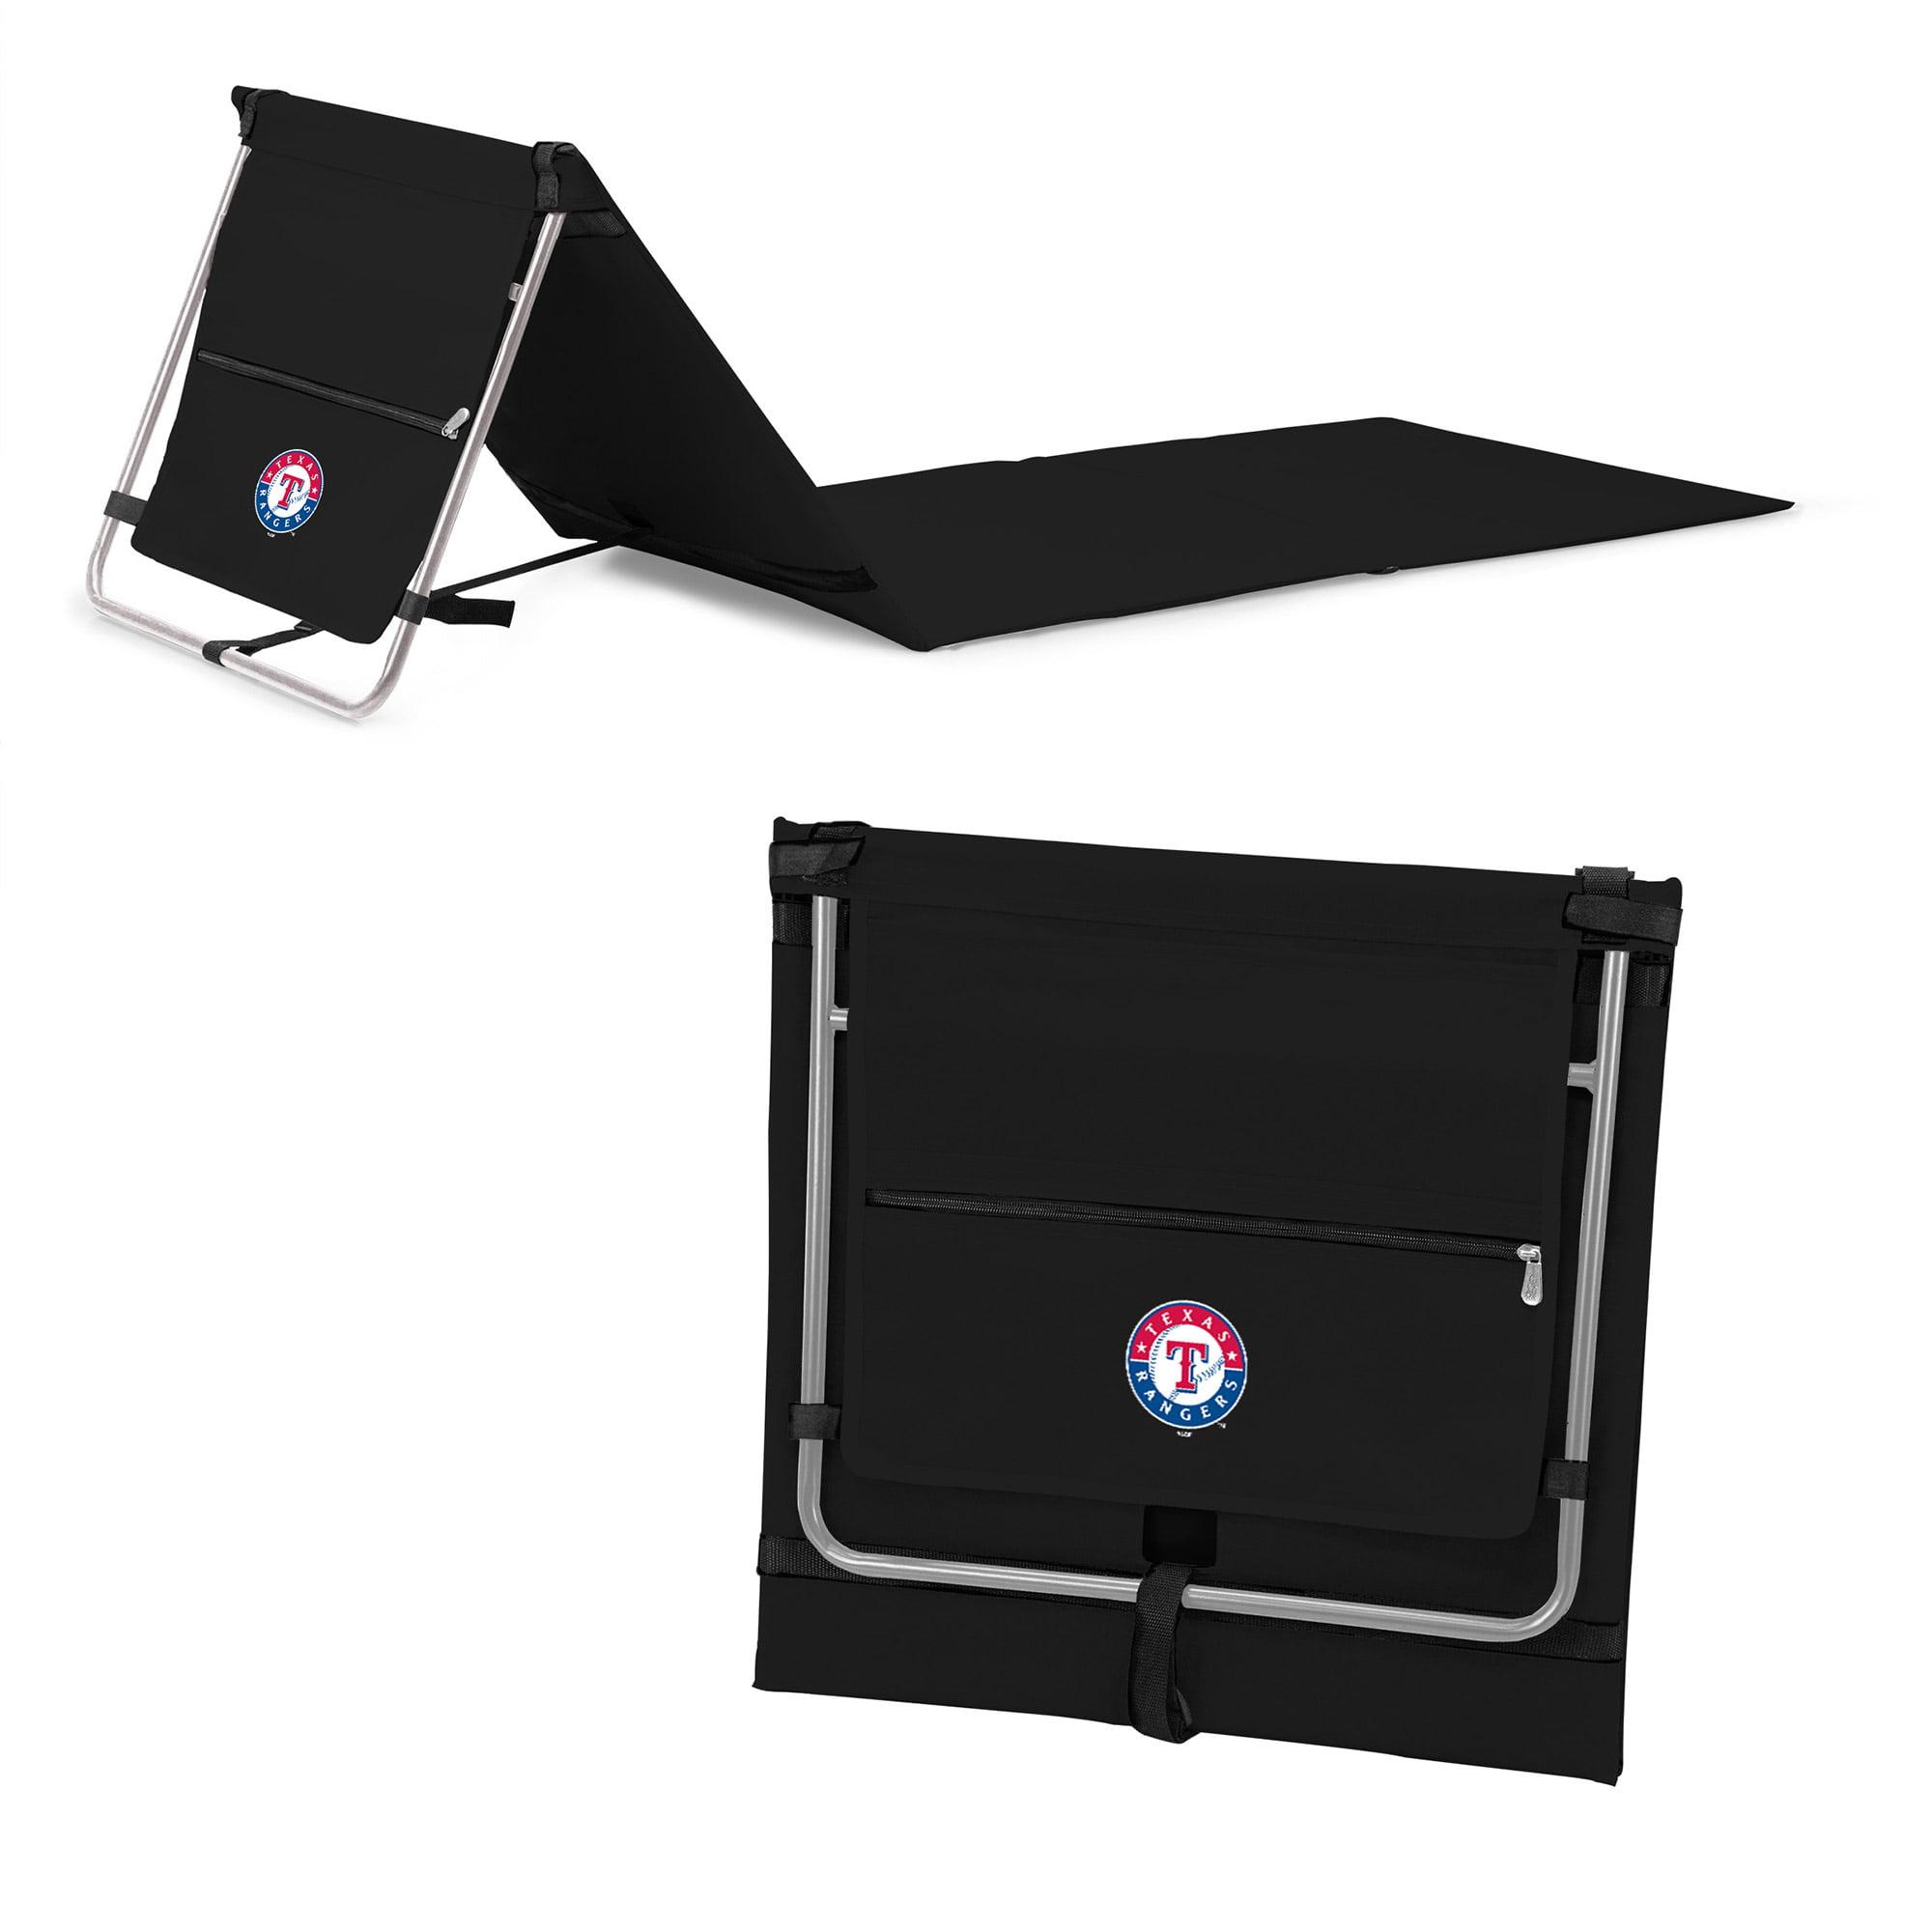 Texas Rangers Portable Lounger Beach Mat - Black - No Size